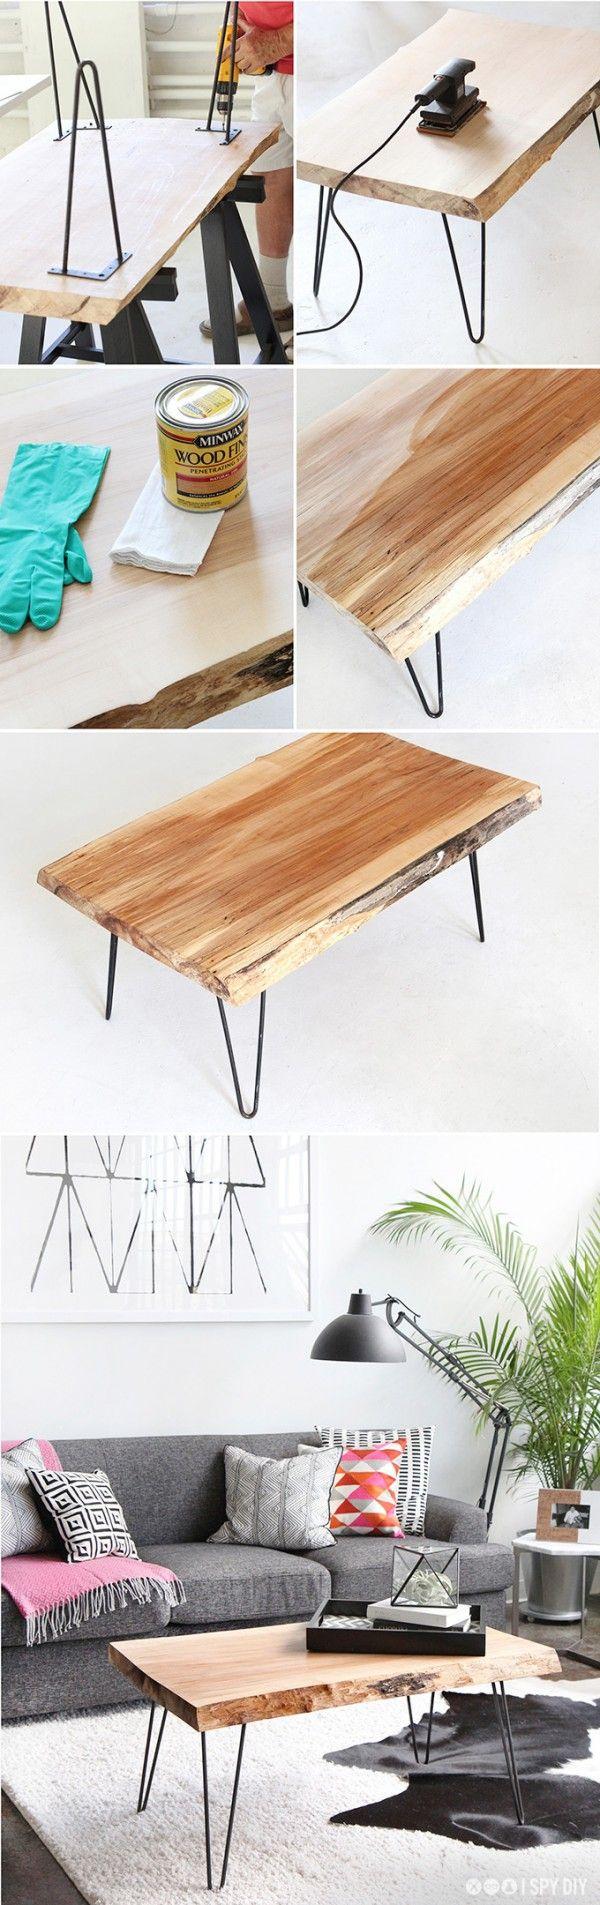 Wood Slab Coffee Table - CT-NV